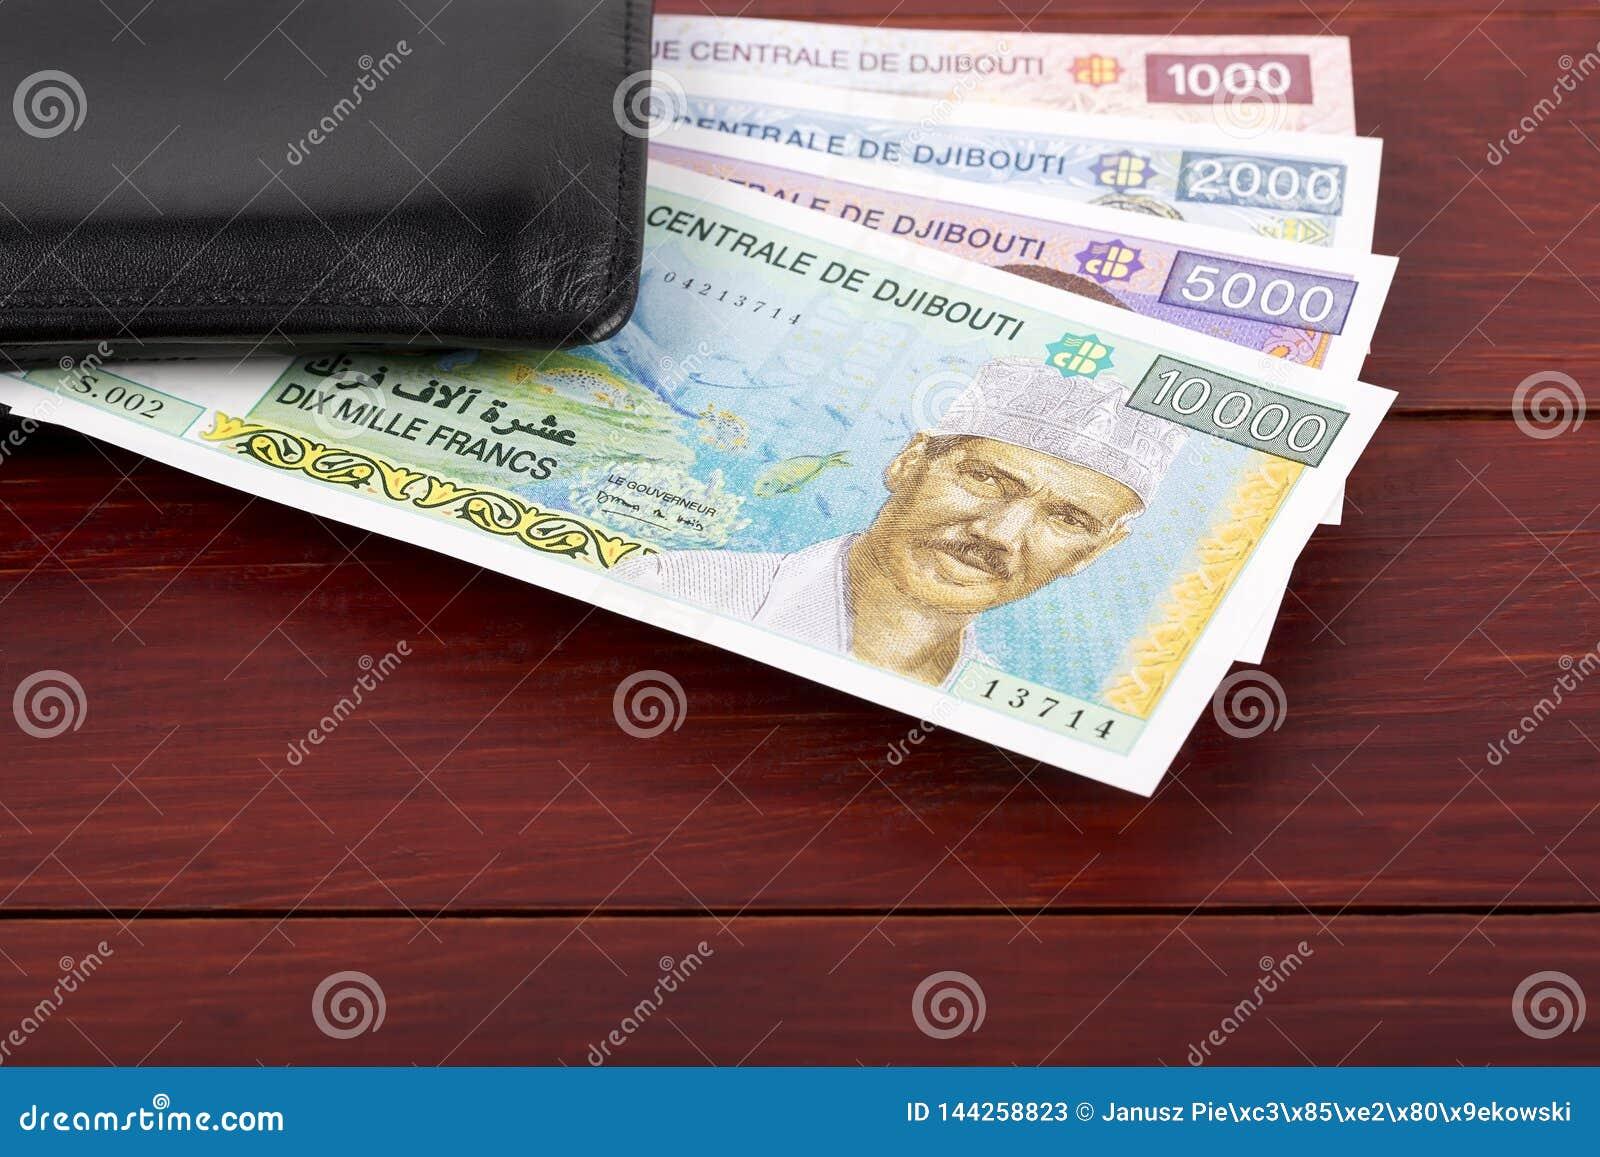 Djiboutian φράγκο στο μαύρο πορτοφόλι